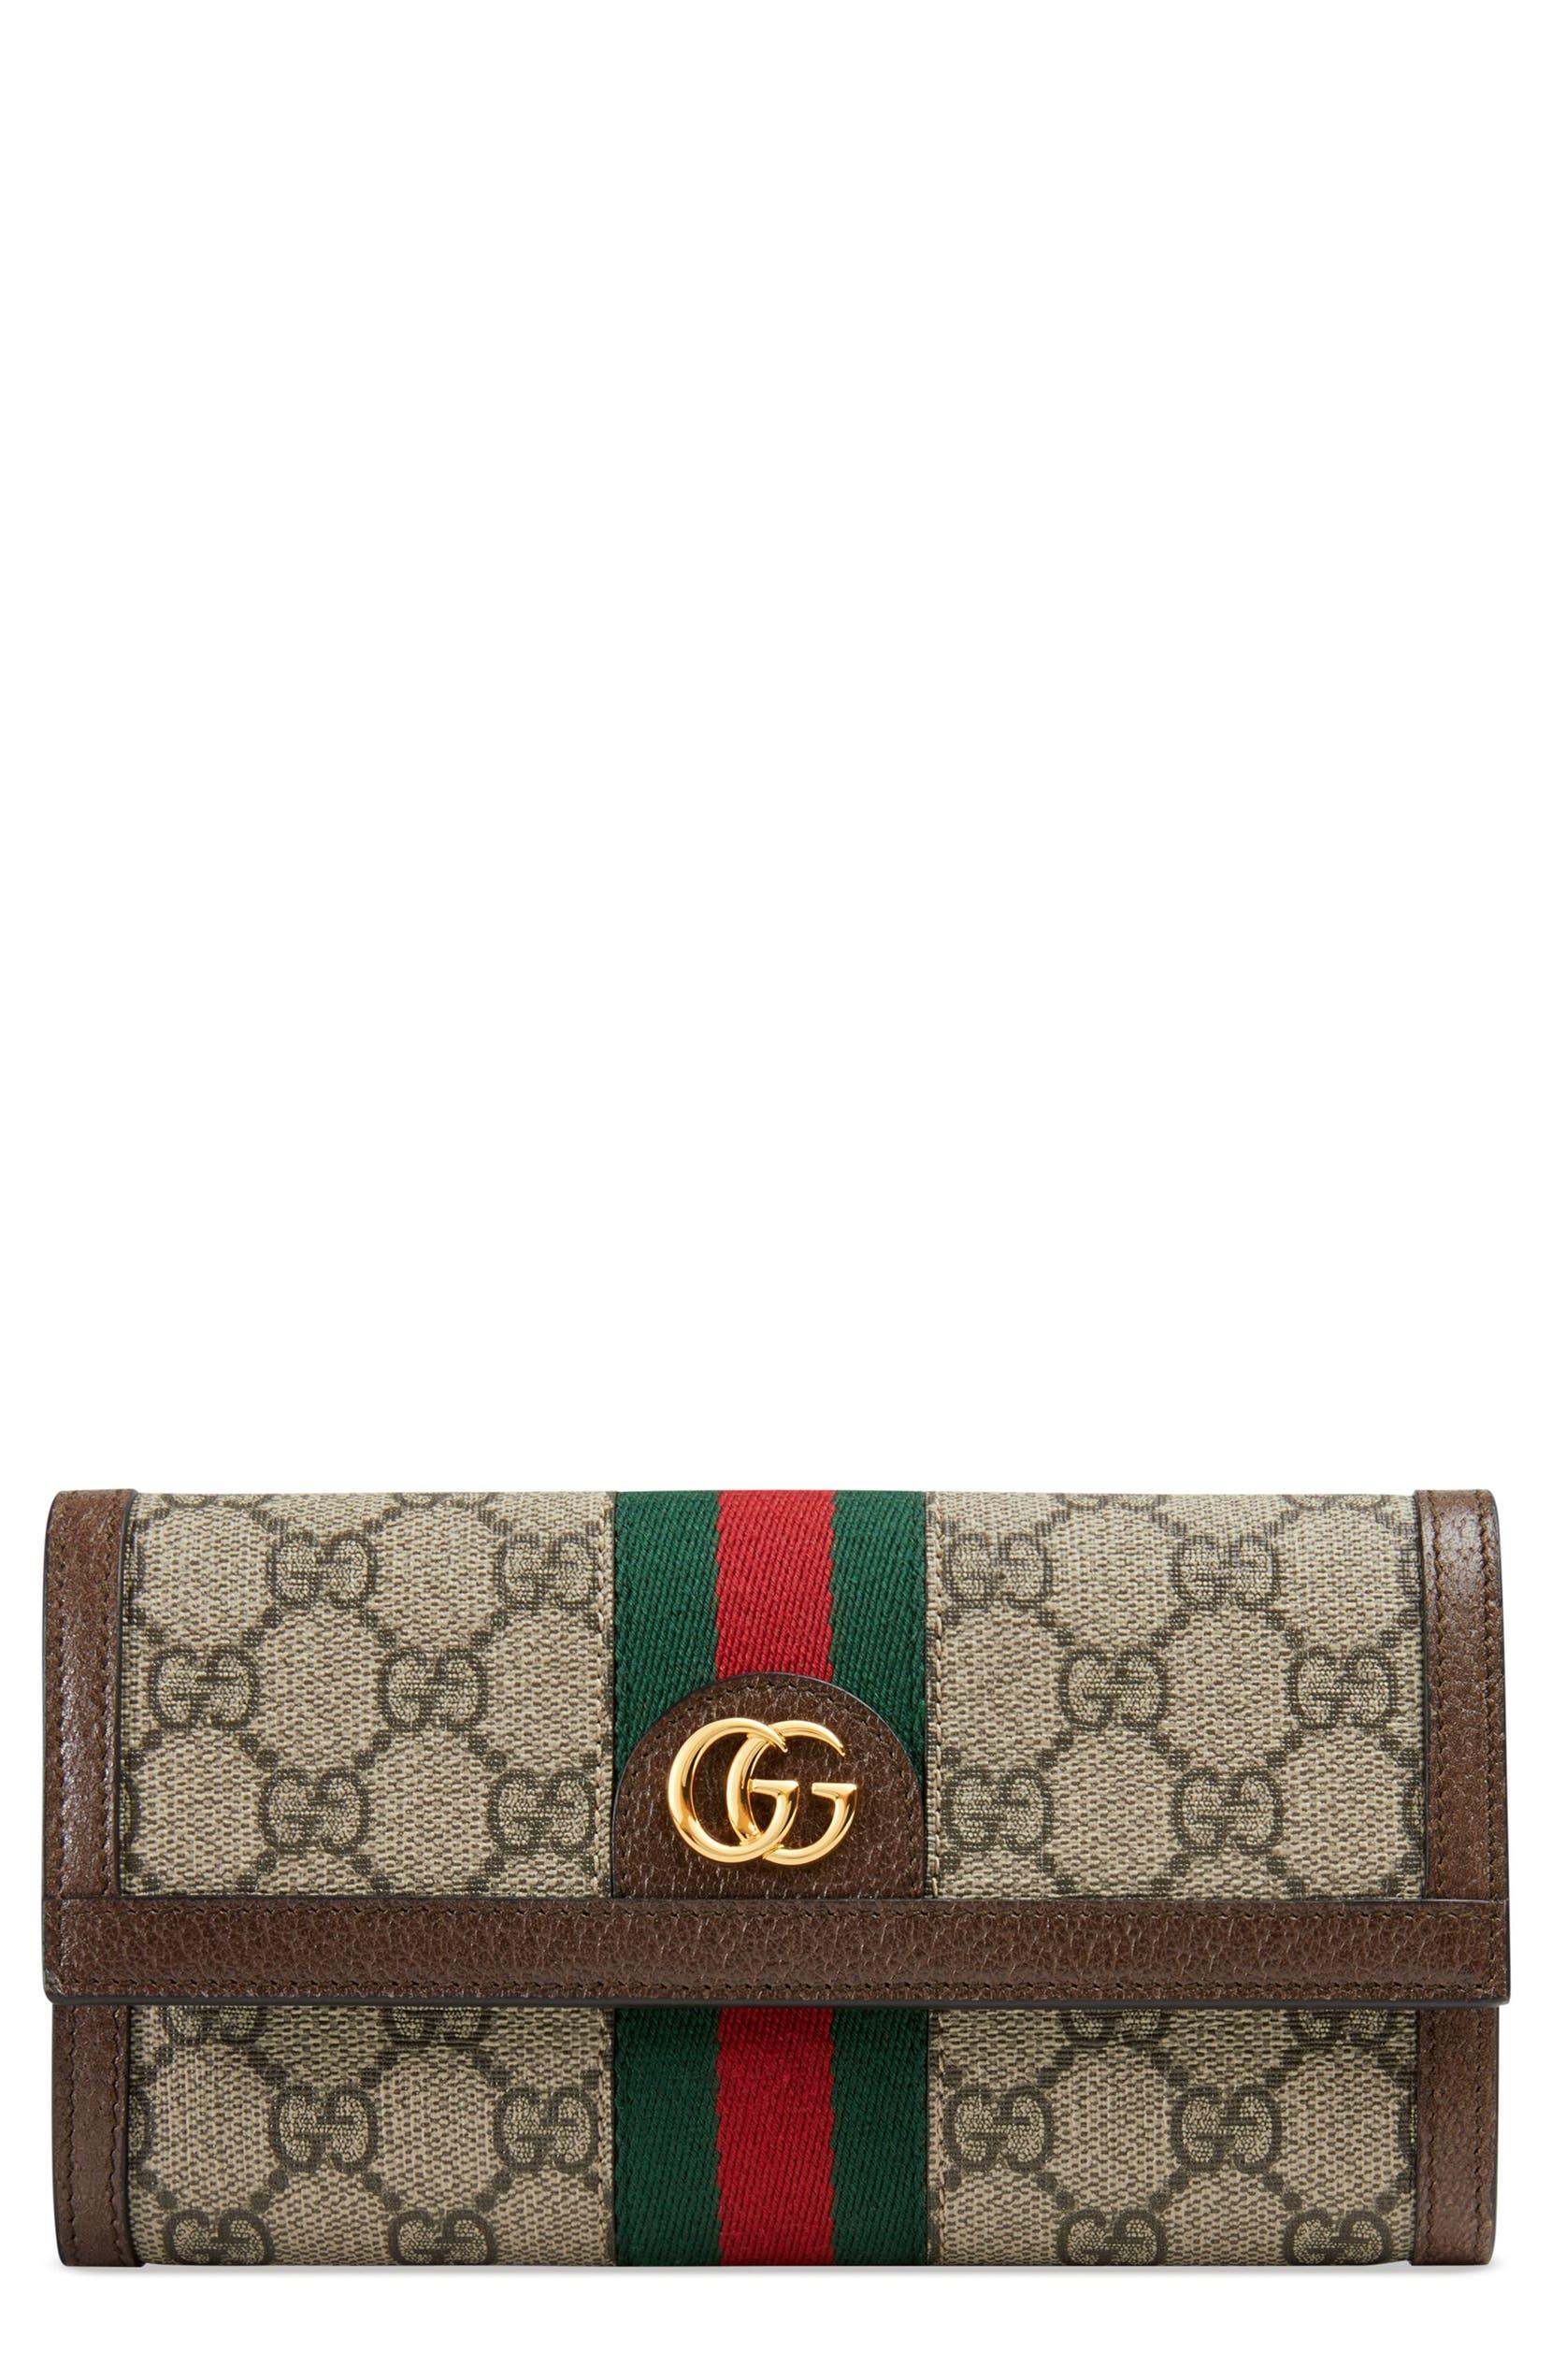 74deb742d78e Gucci Ophidia GG Supreme Continental Wallet | Nordstrom